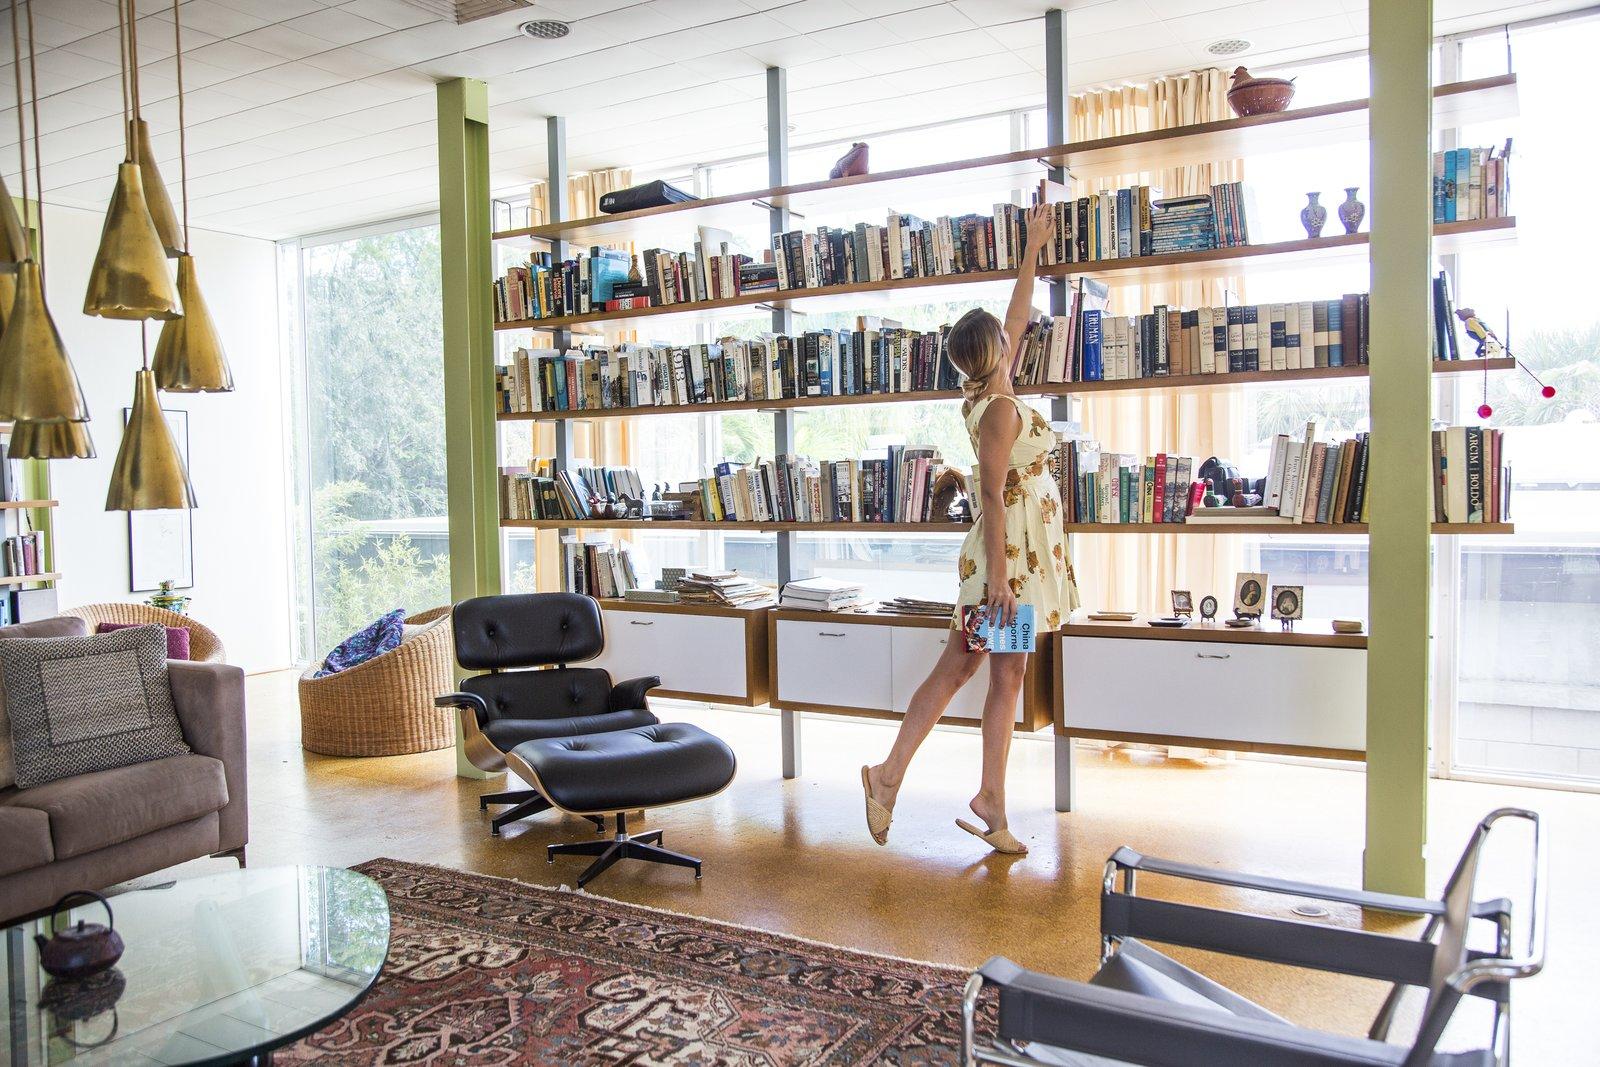 Living Room, Chair, Sofa, Ceiling Lighting, Pendant Lighting, Cork Floor, Bookcase, Rug Floor, and Coffee Tables  Hiss Studio